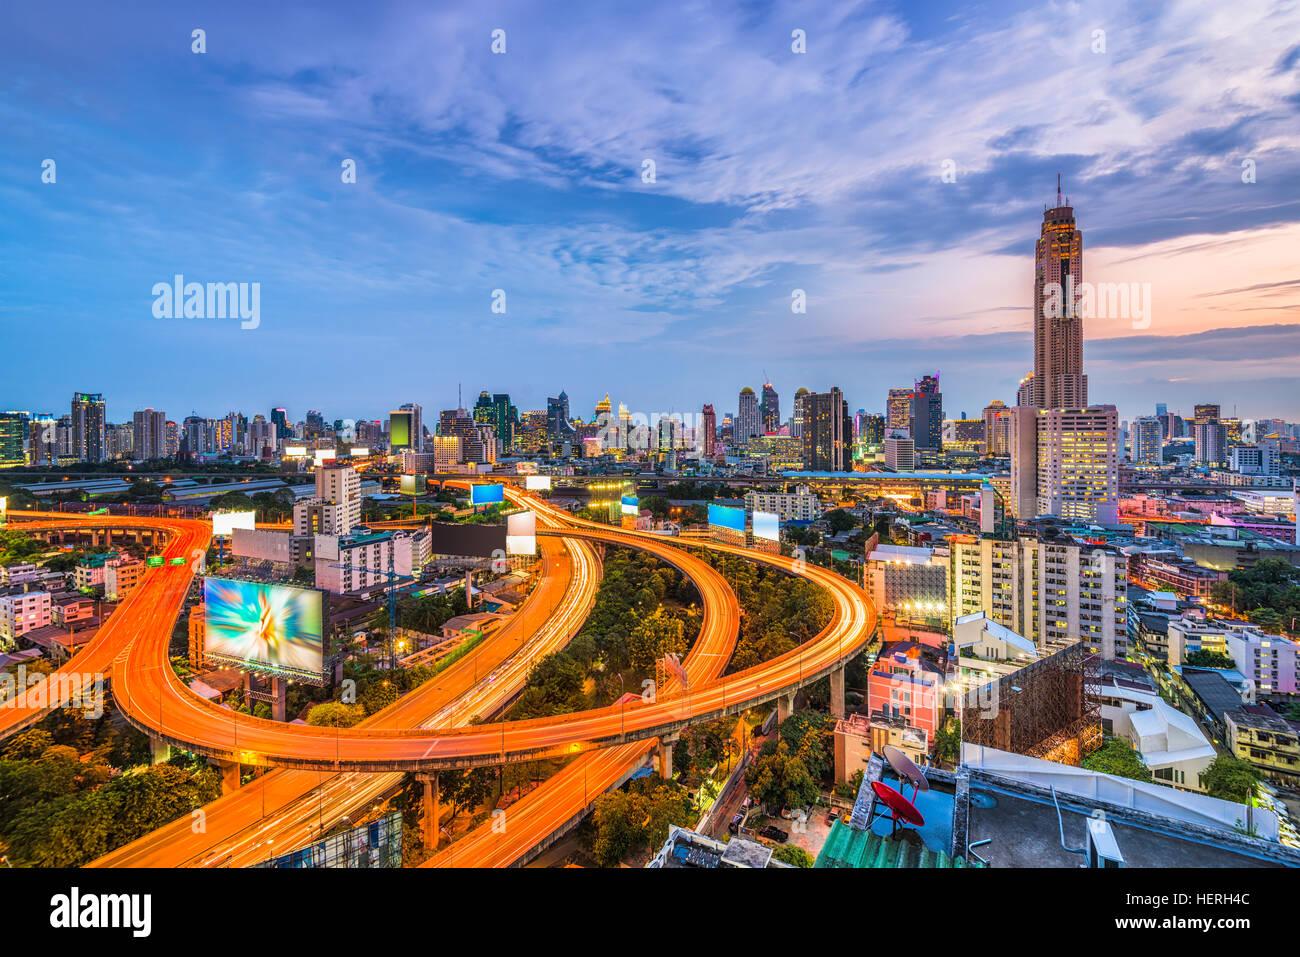 Skyline von Bangkok, Thailand vom Bezirk Ratchathewi. Stockbild